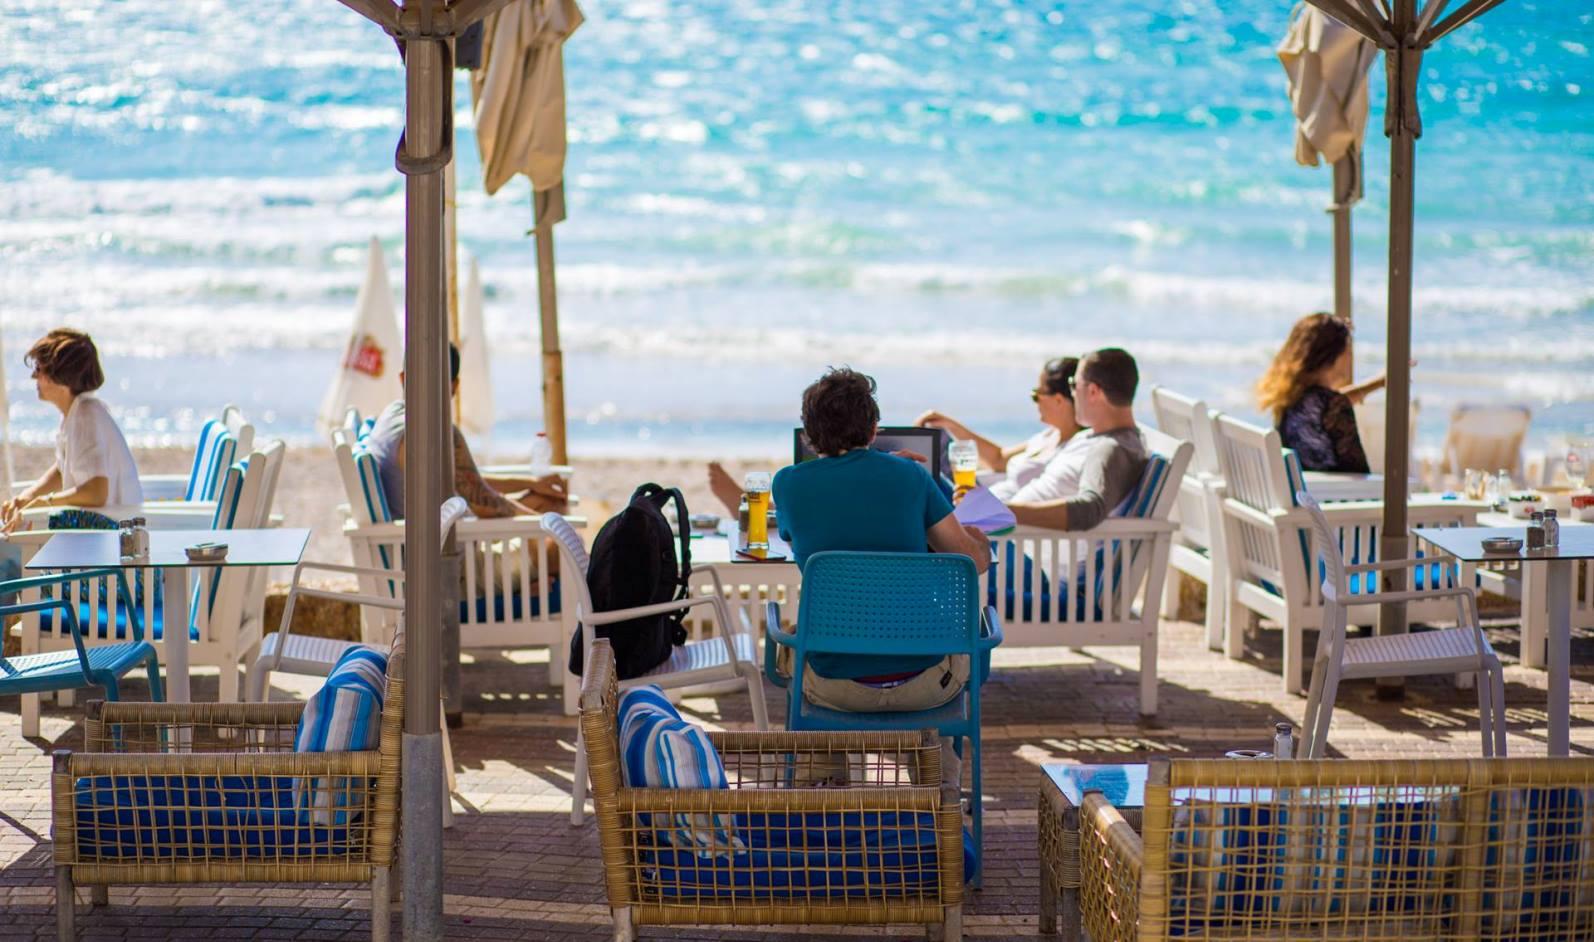 Diners at Nika Beach restaurant, Herzliya Pituah. Photo via Facebook